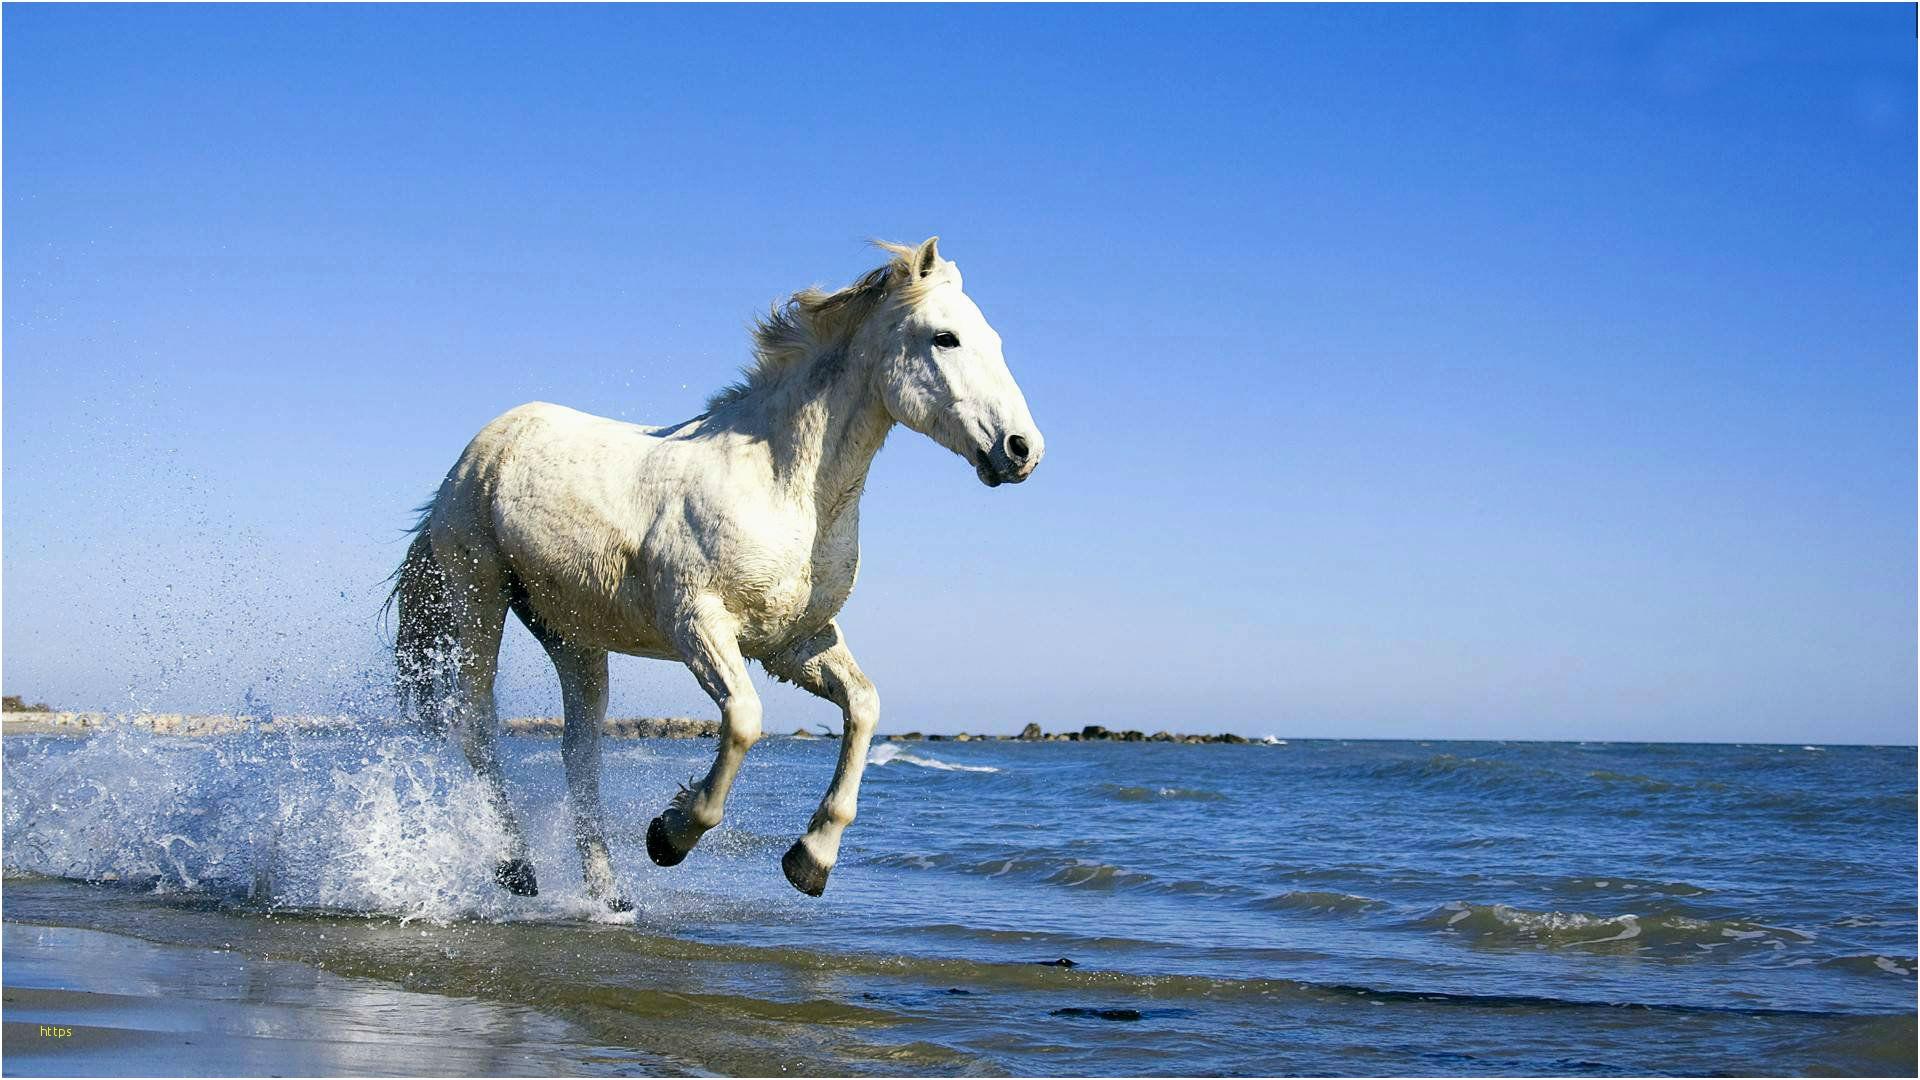 Horse Wallpaper Best Of Horses Hd Wallpapers Horse - Full Hd Wallpaper Download For Windows 7 , HD Wallpaper & Backgrounds